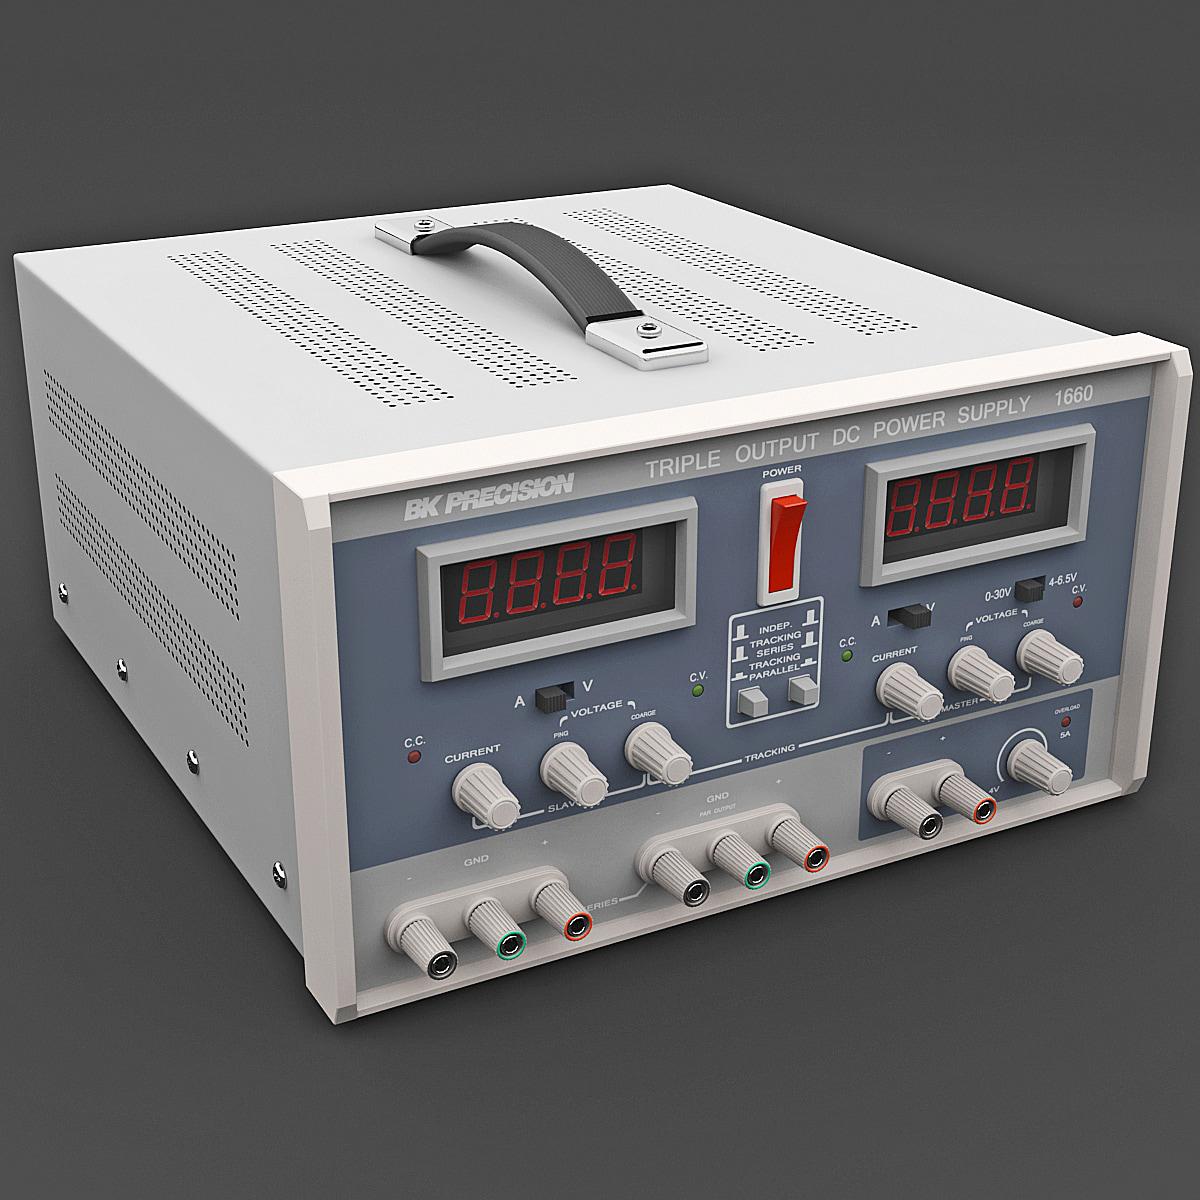 BK_Precision_1660_Power_Supply_001.jpg